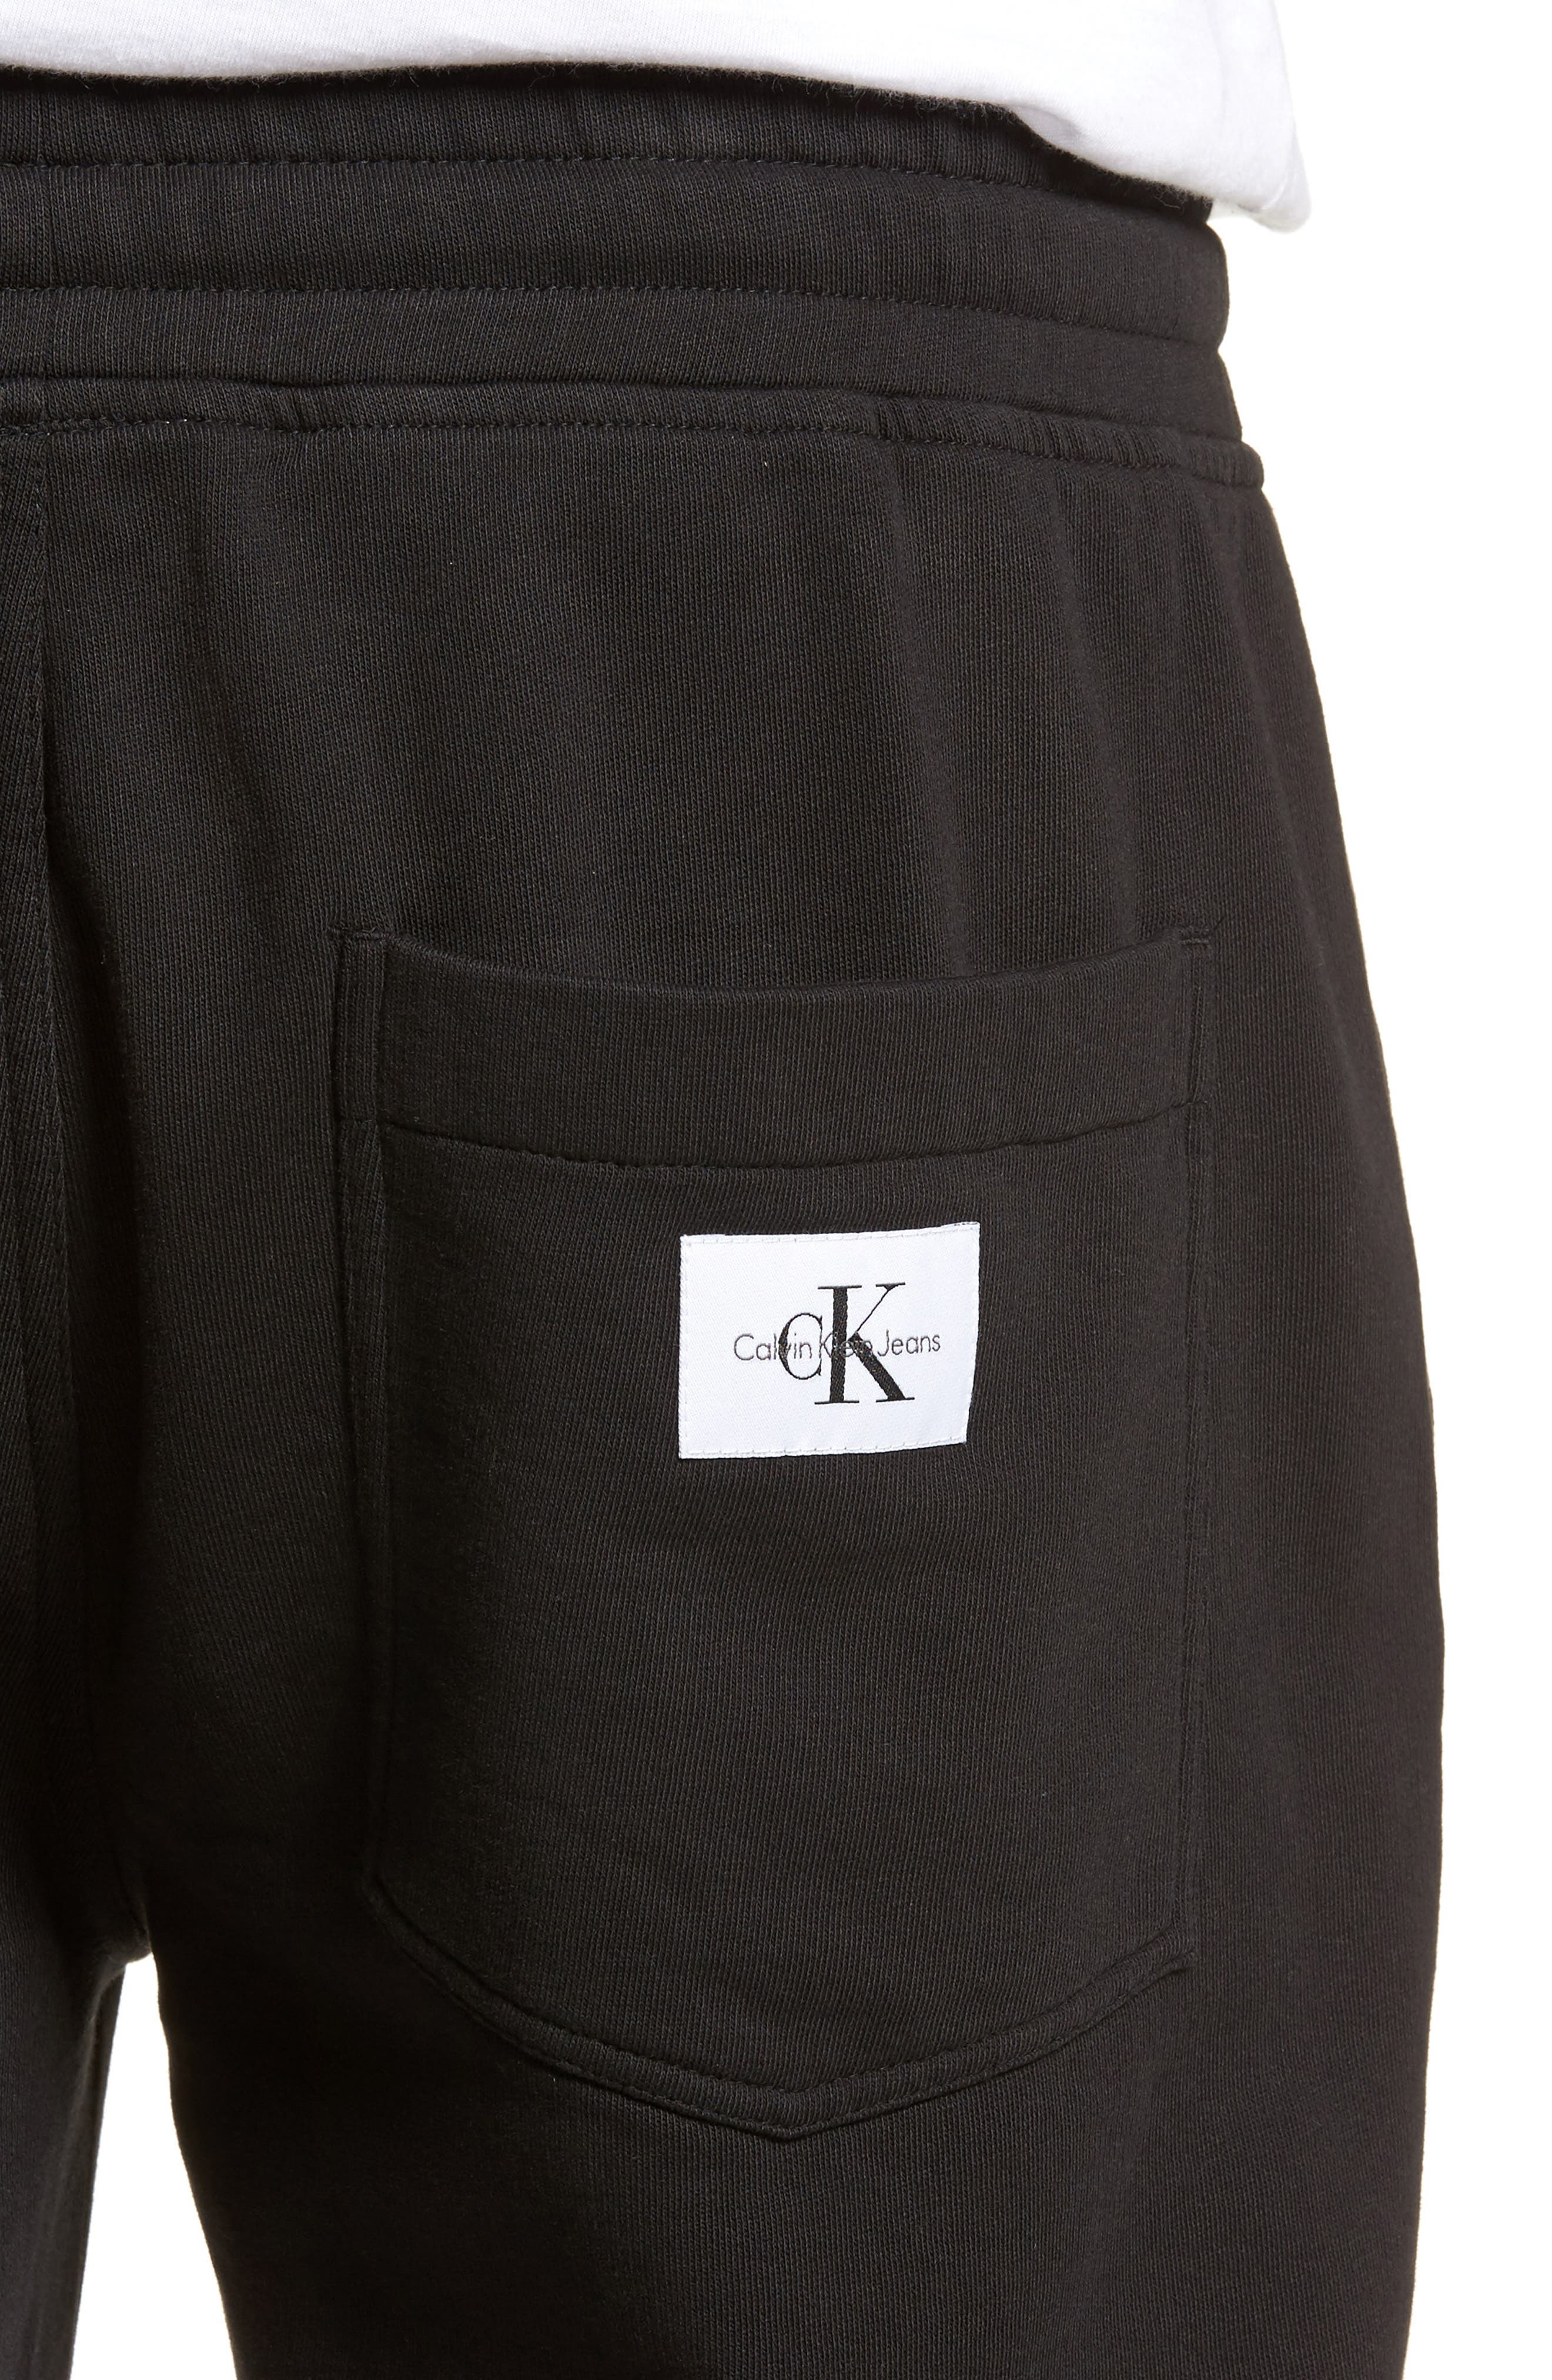 Stripe Athletic Shorts,                             Alternate thumbnail 4, color,                             010